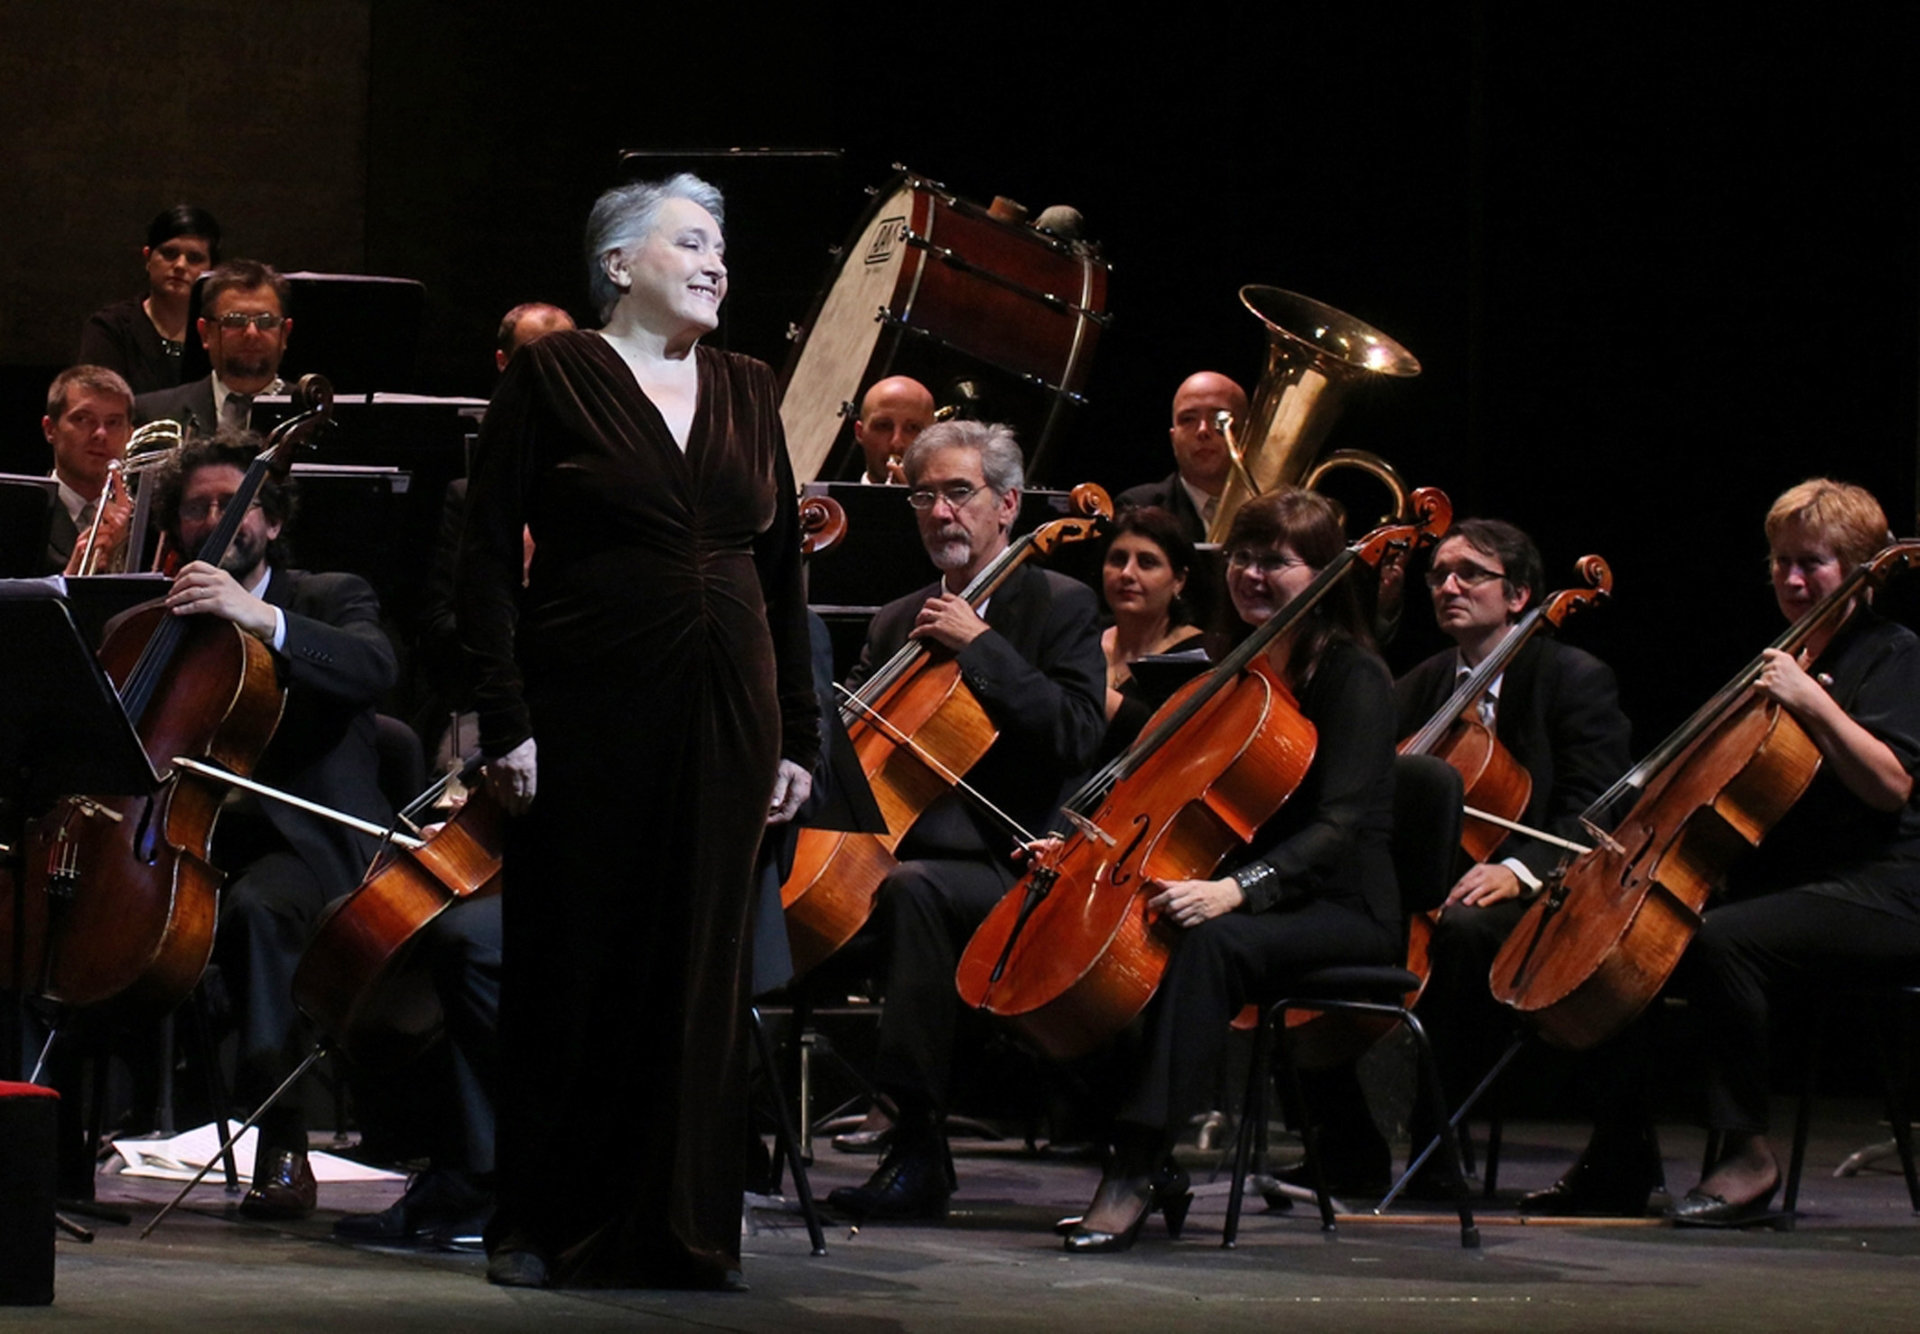 Koncert pod dirigentskim vodstvom operne dive Dunje Vejzović